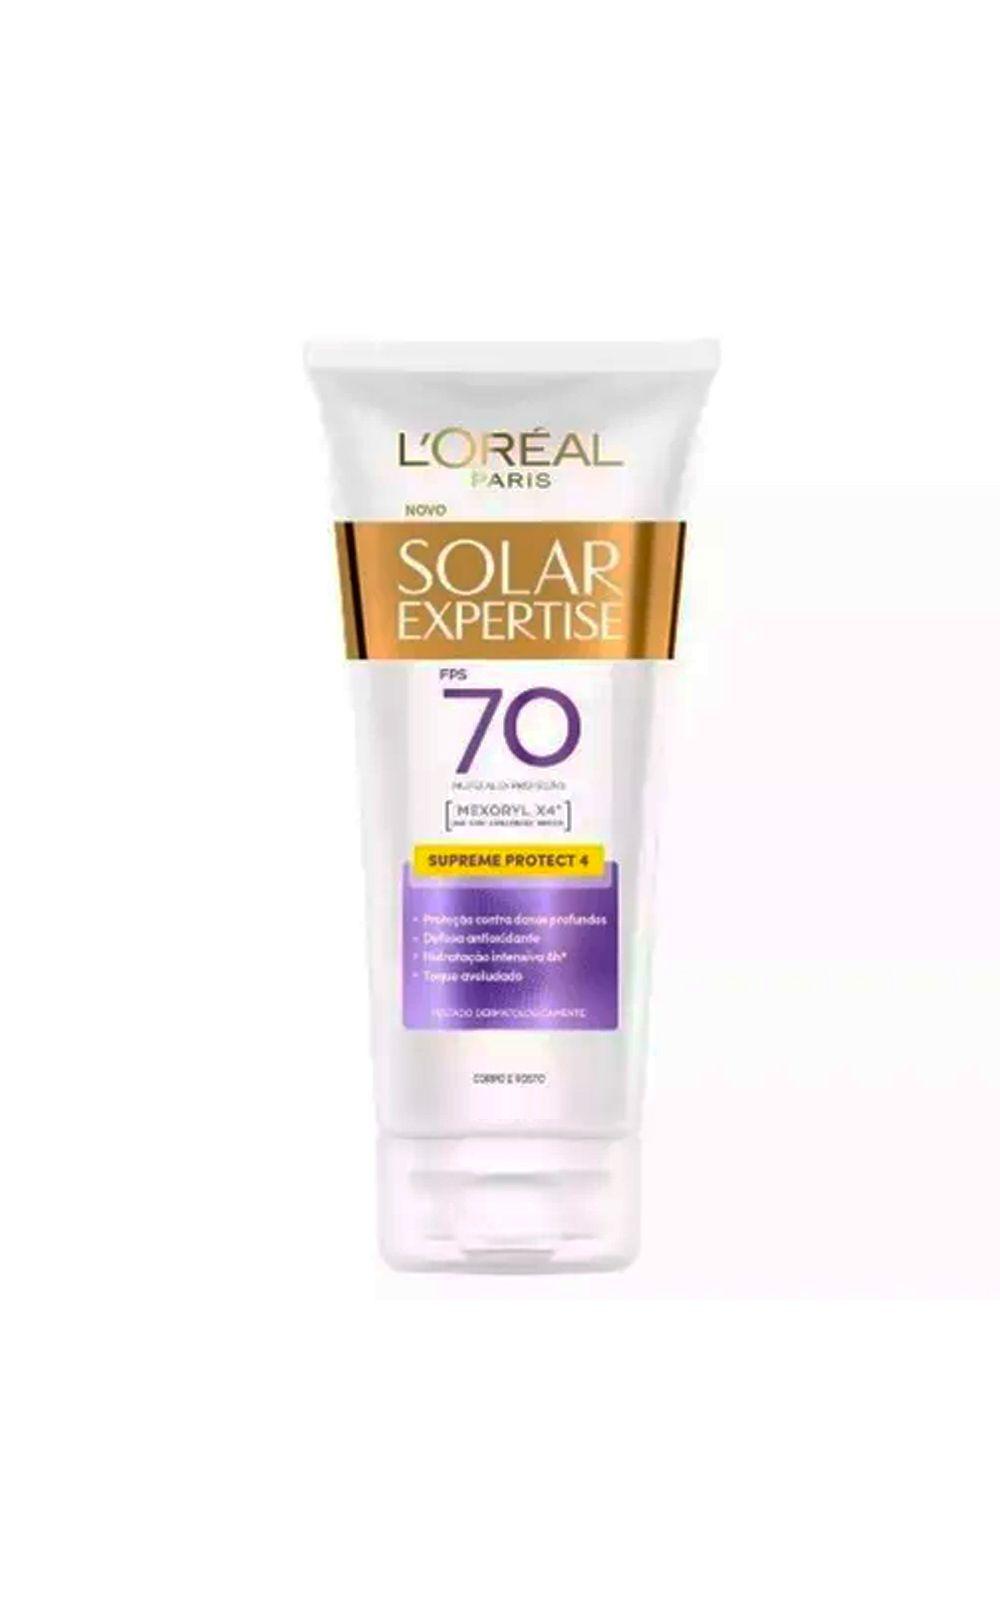 Foto 2 - L'Oréal Paris Solar Expertise Ganhe Solar Expertise Facial Antirrugas Kit - Protetor Solar Corporal + Protetor Solar Facial - Kit